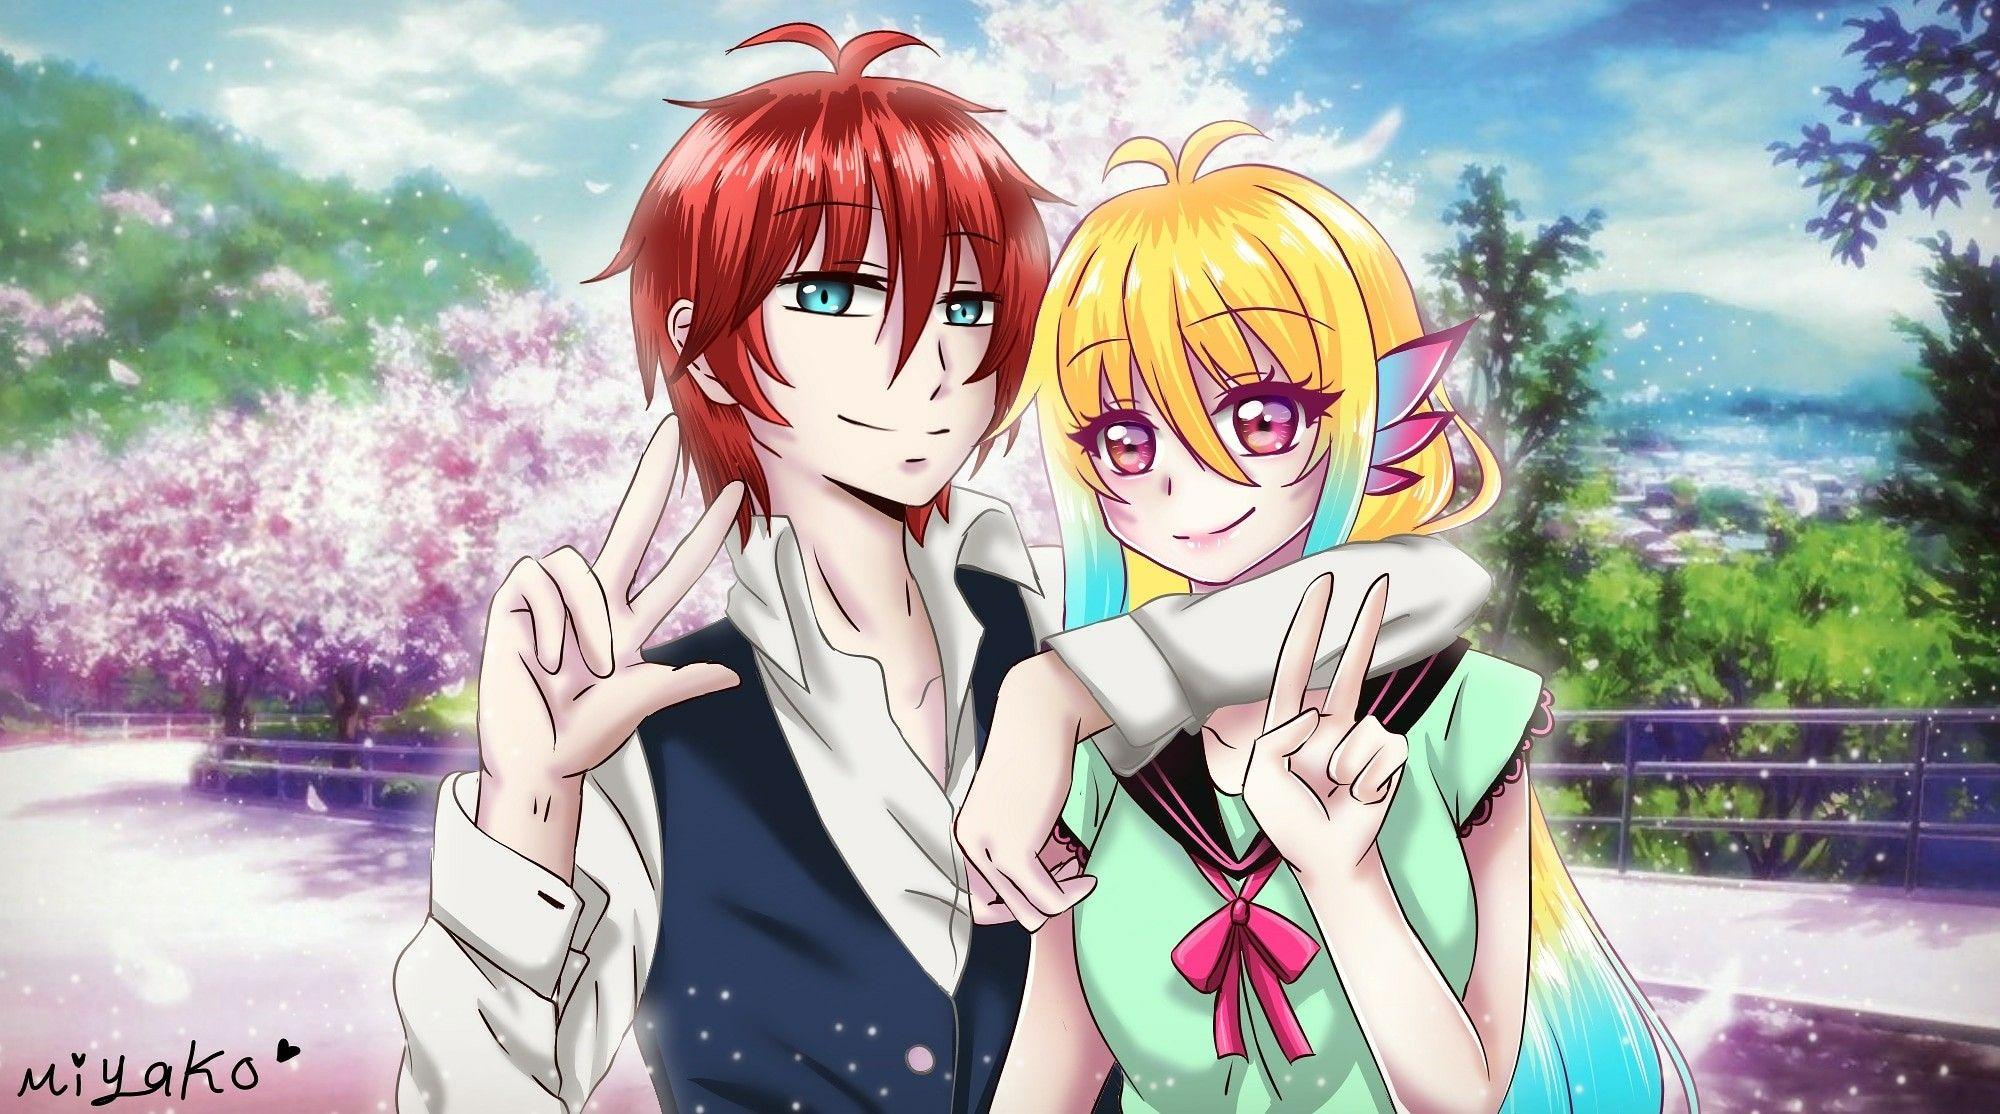 Animatic anime romantic drawing art Miyako مياكو